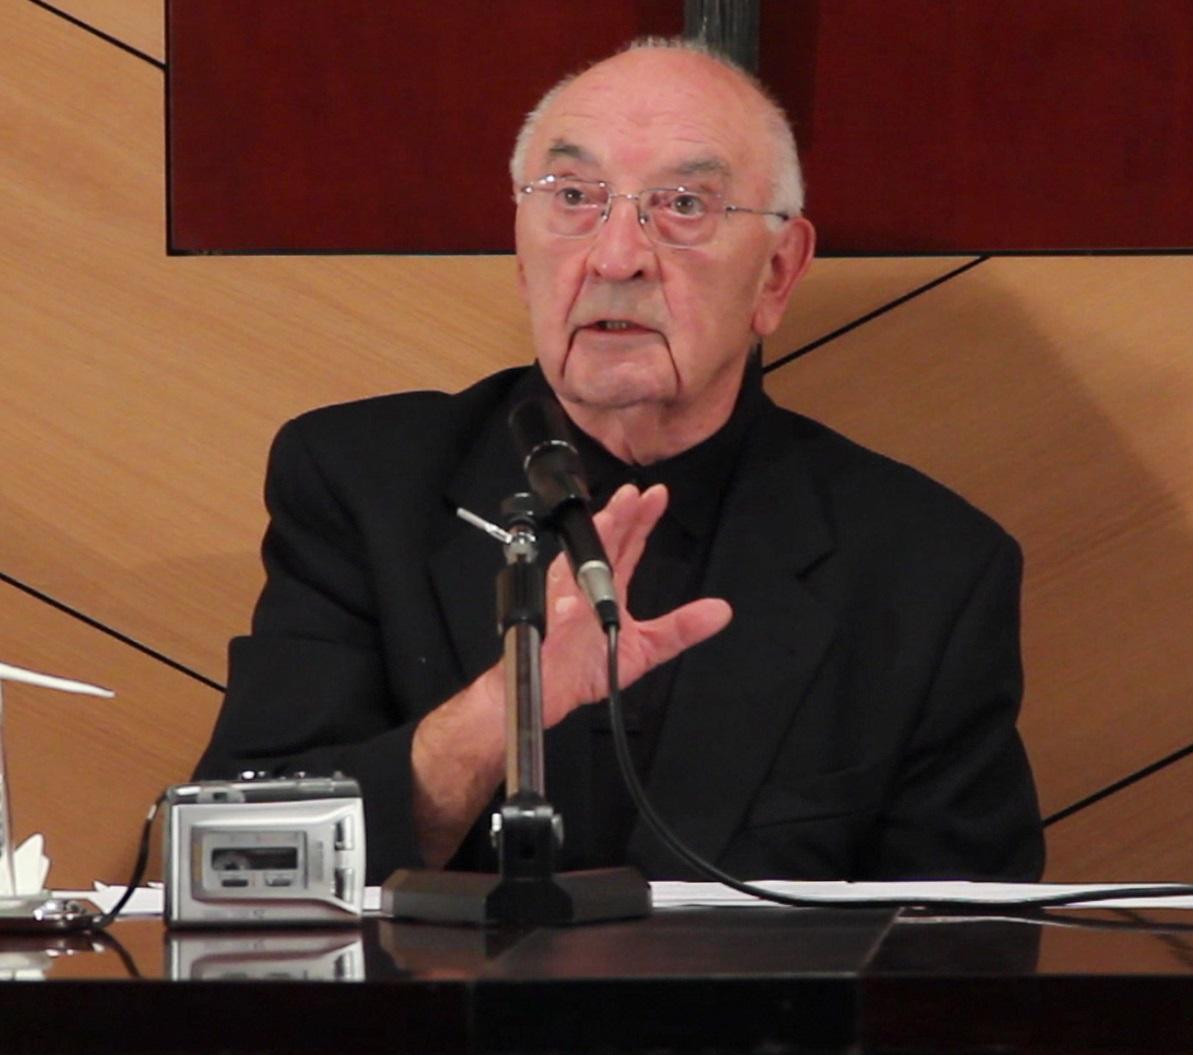 Don Mariano Jose Ibarguengoitia gogoan